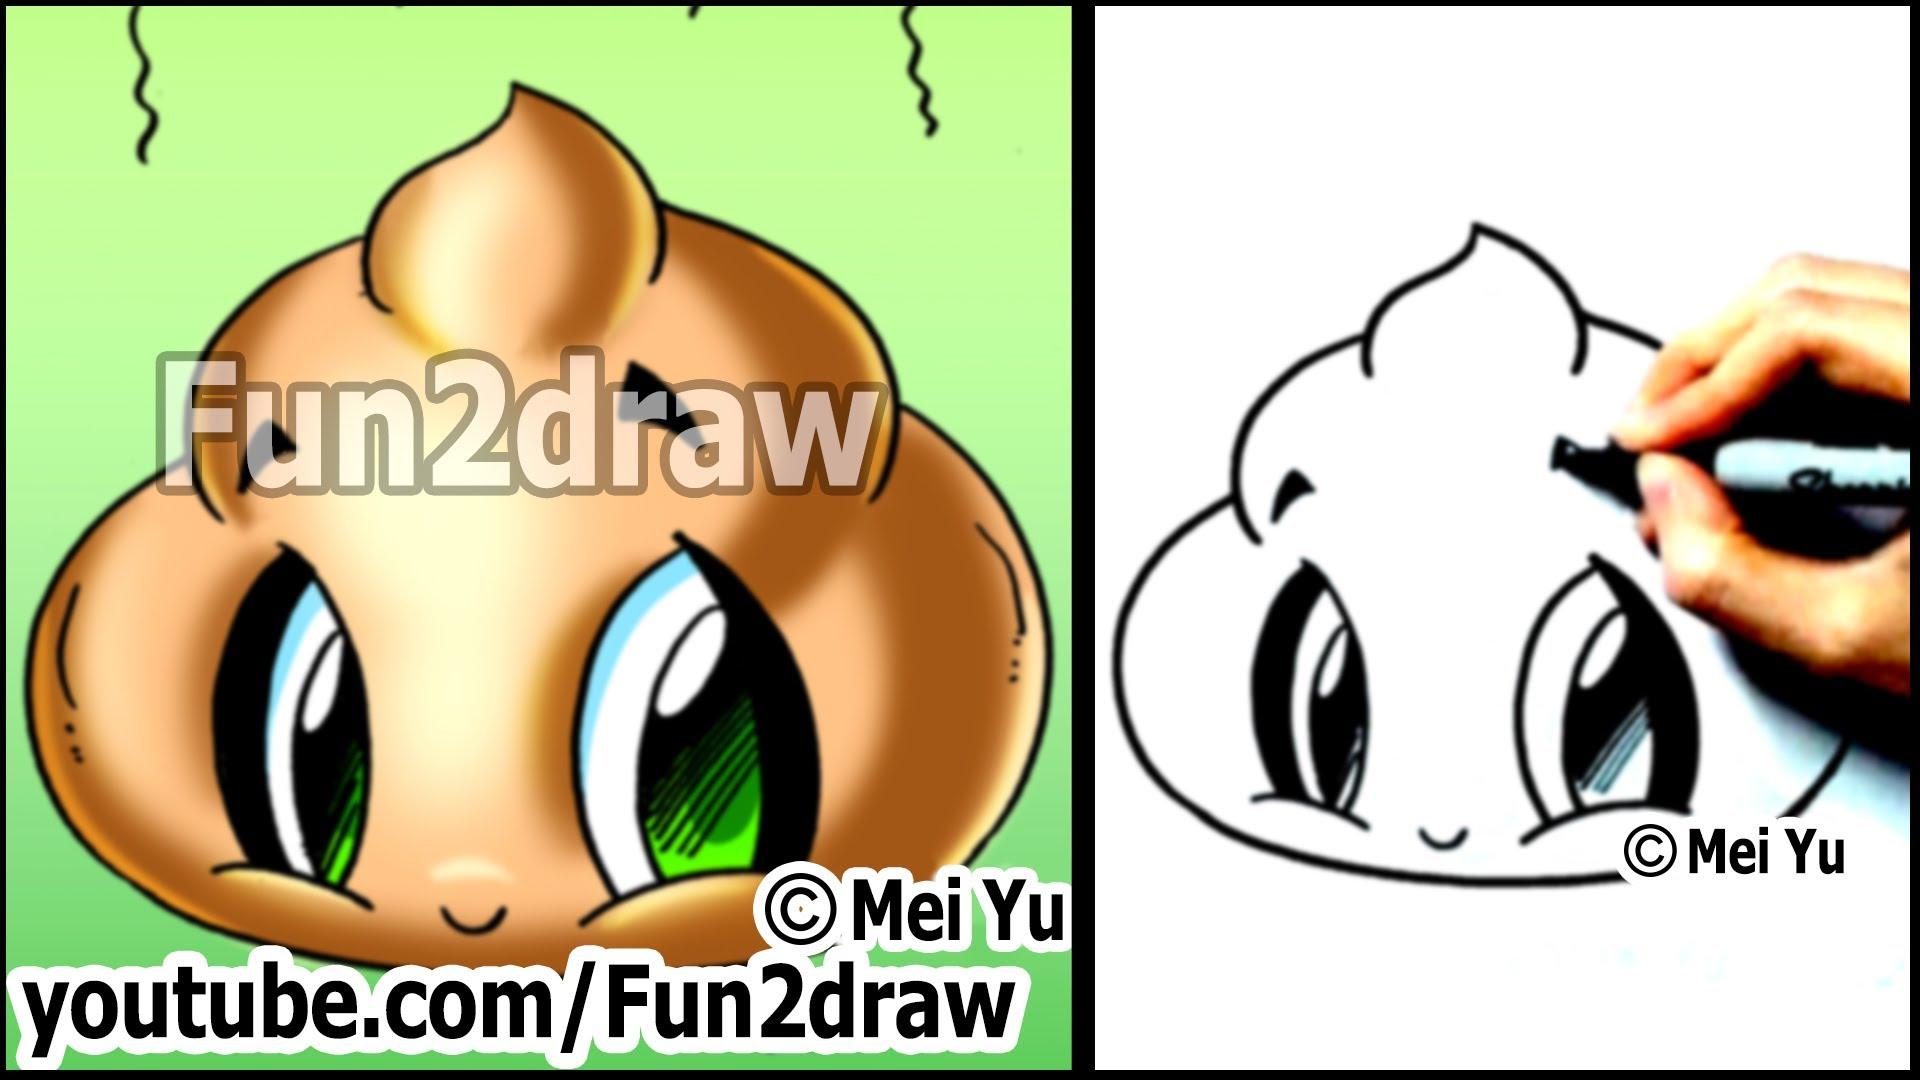 Drawn watermelon fun2draw Funny How YouTube Cute Step